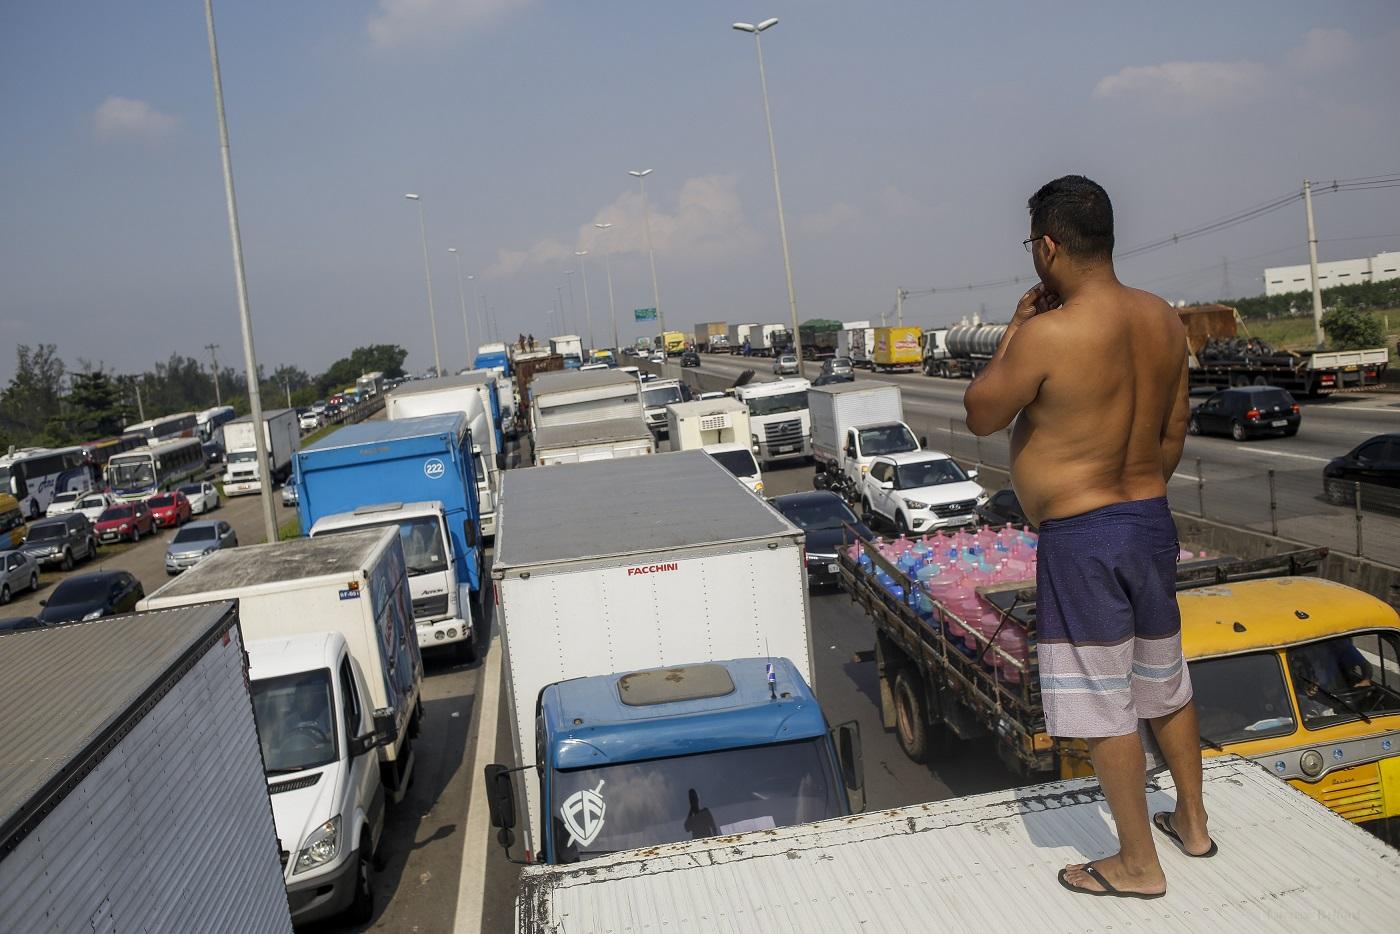 Caminhões parados durante a greve na Washinton Luiz (BR-040) , perto da Refinaria Duque de Caxias. Foto Luciano Belford/AGIF